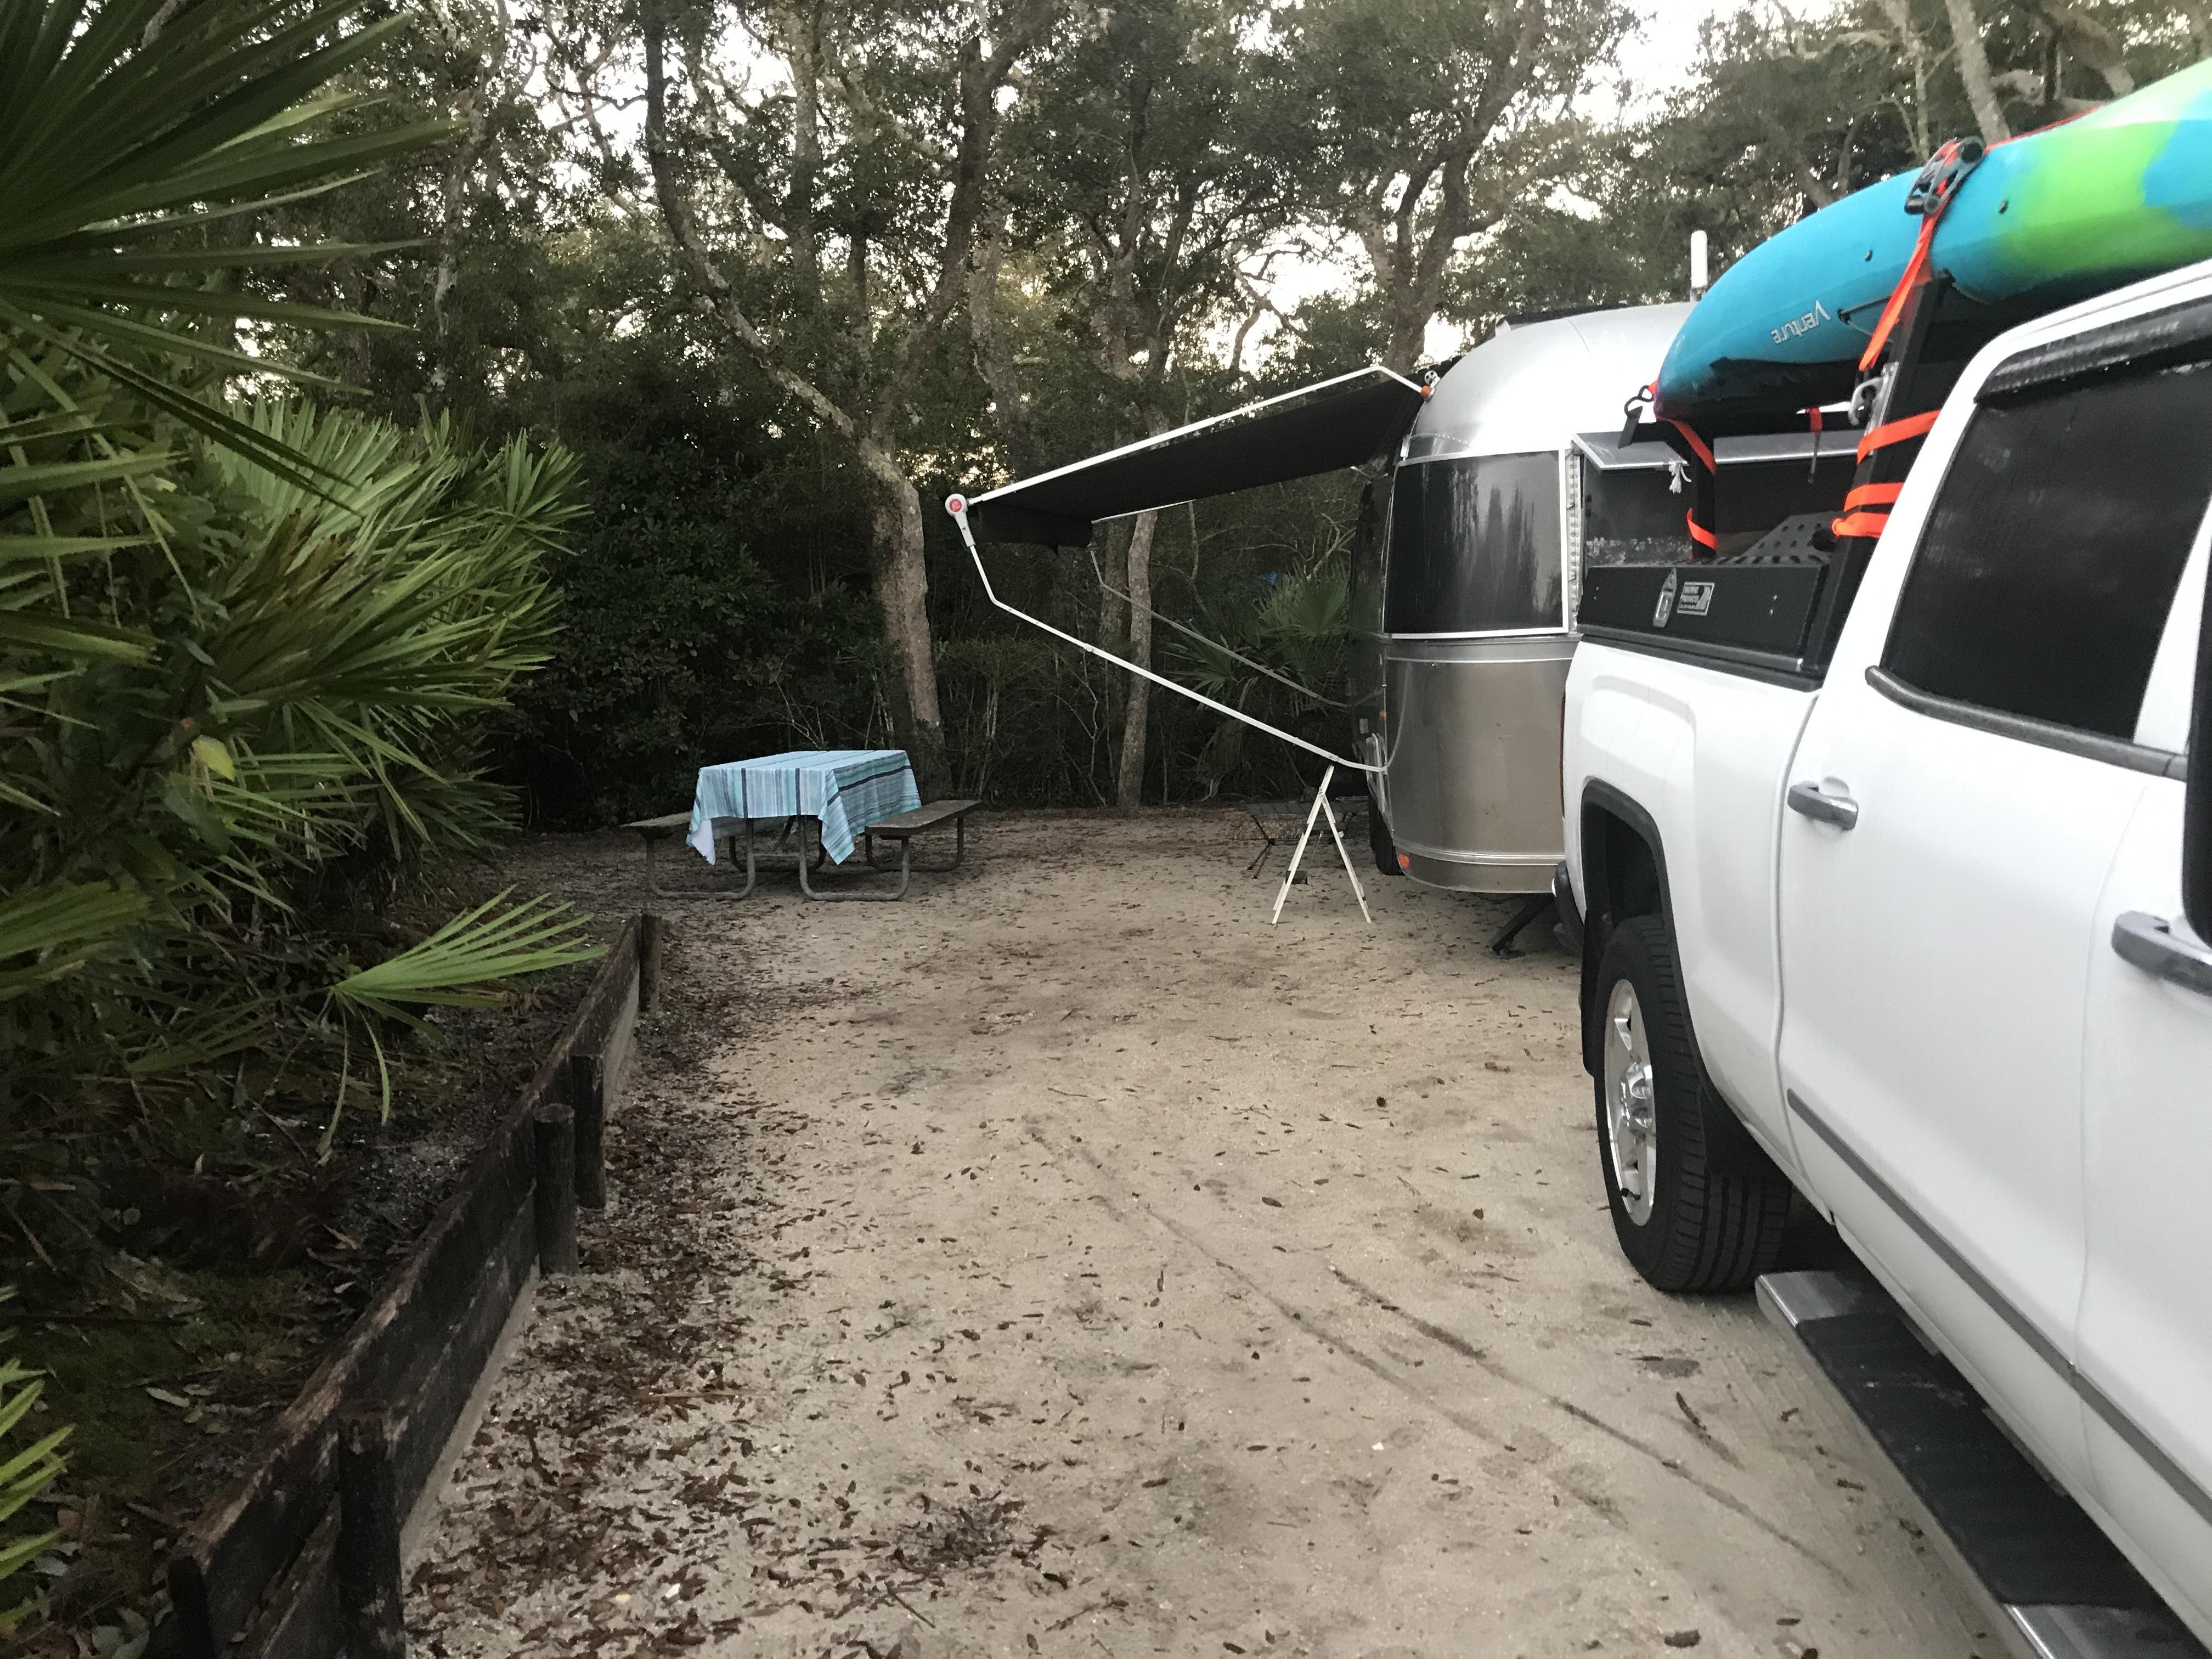 North Beach Camp Resort